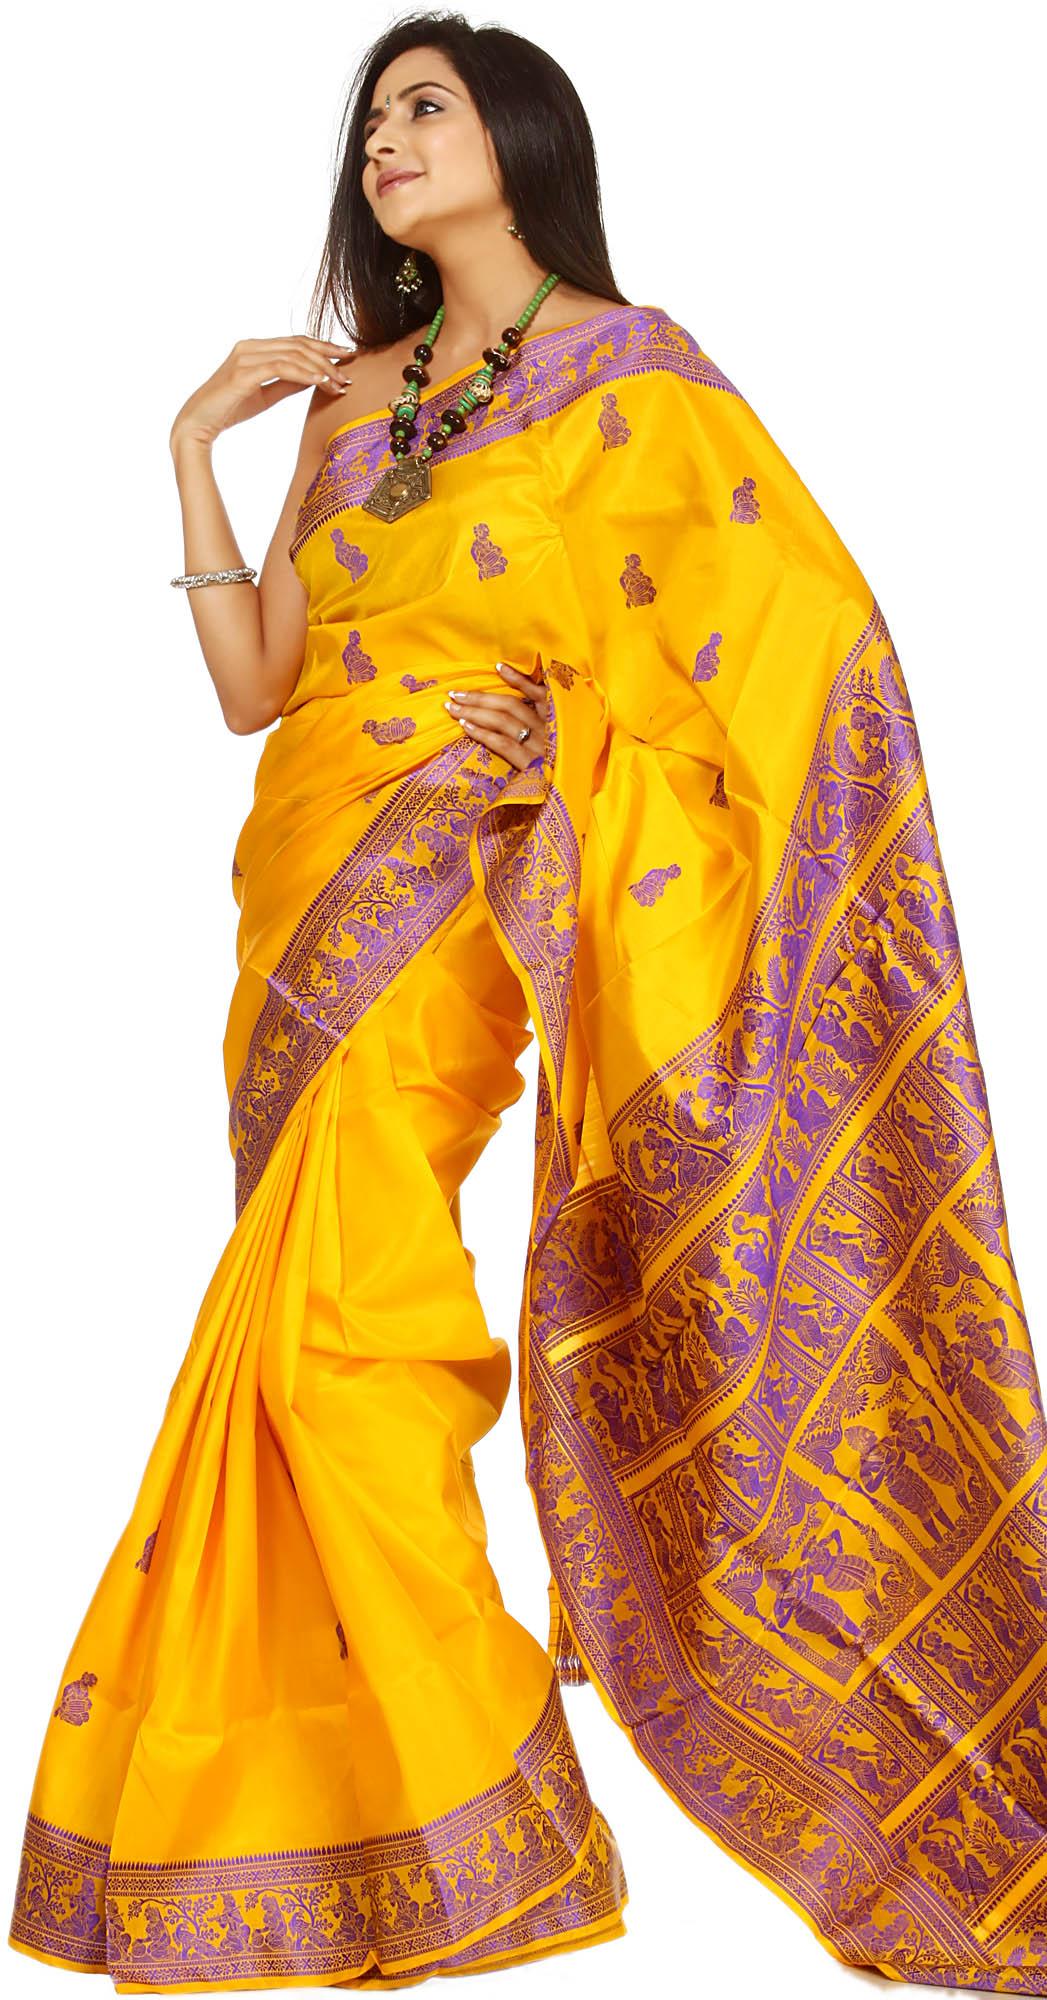 Freesia-Yellow Baluchari Sari Depicting Mythological Episodes